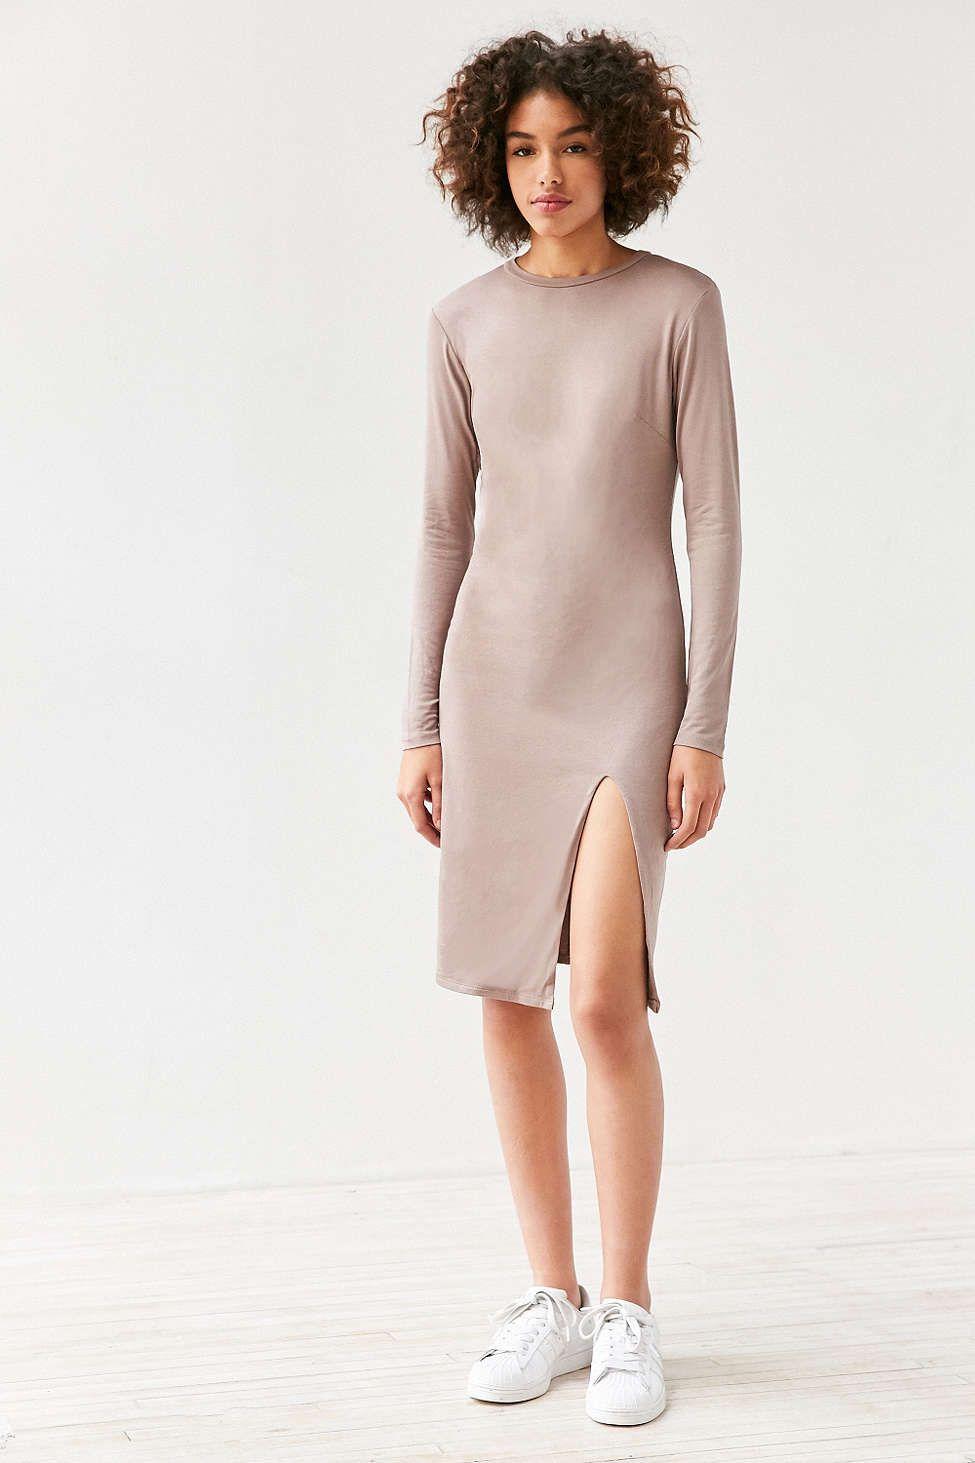 8c05637e694 Silence + Noise Mock Neck Bodycon Midi Dress - Urban Outfitters